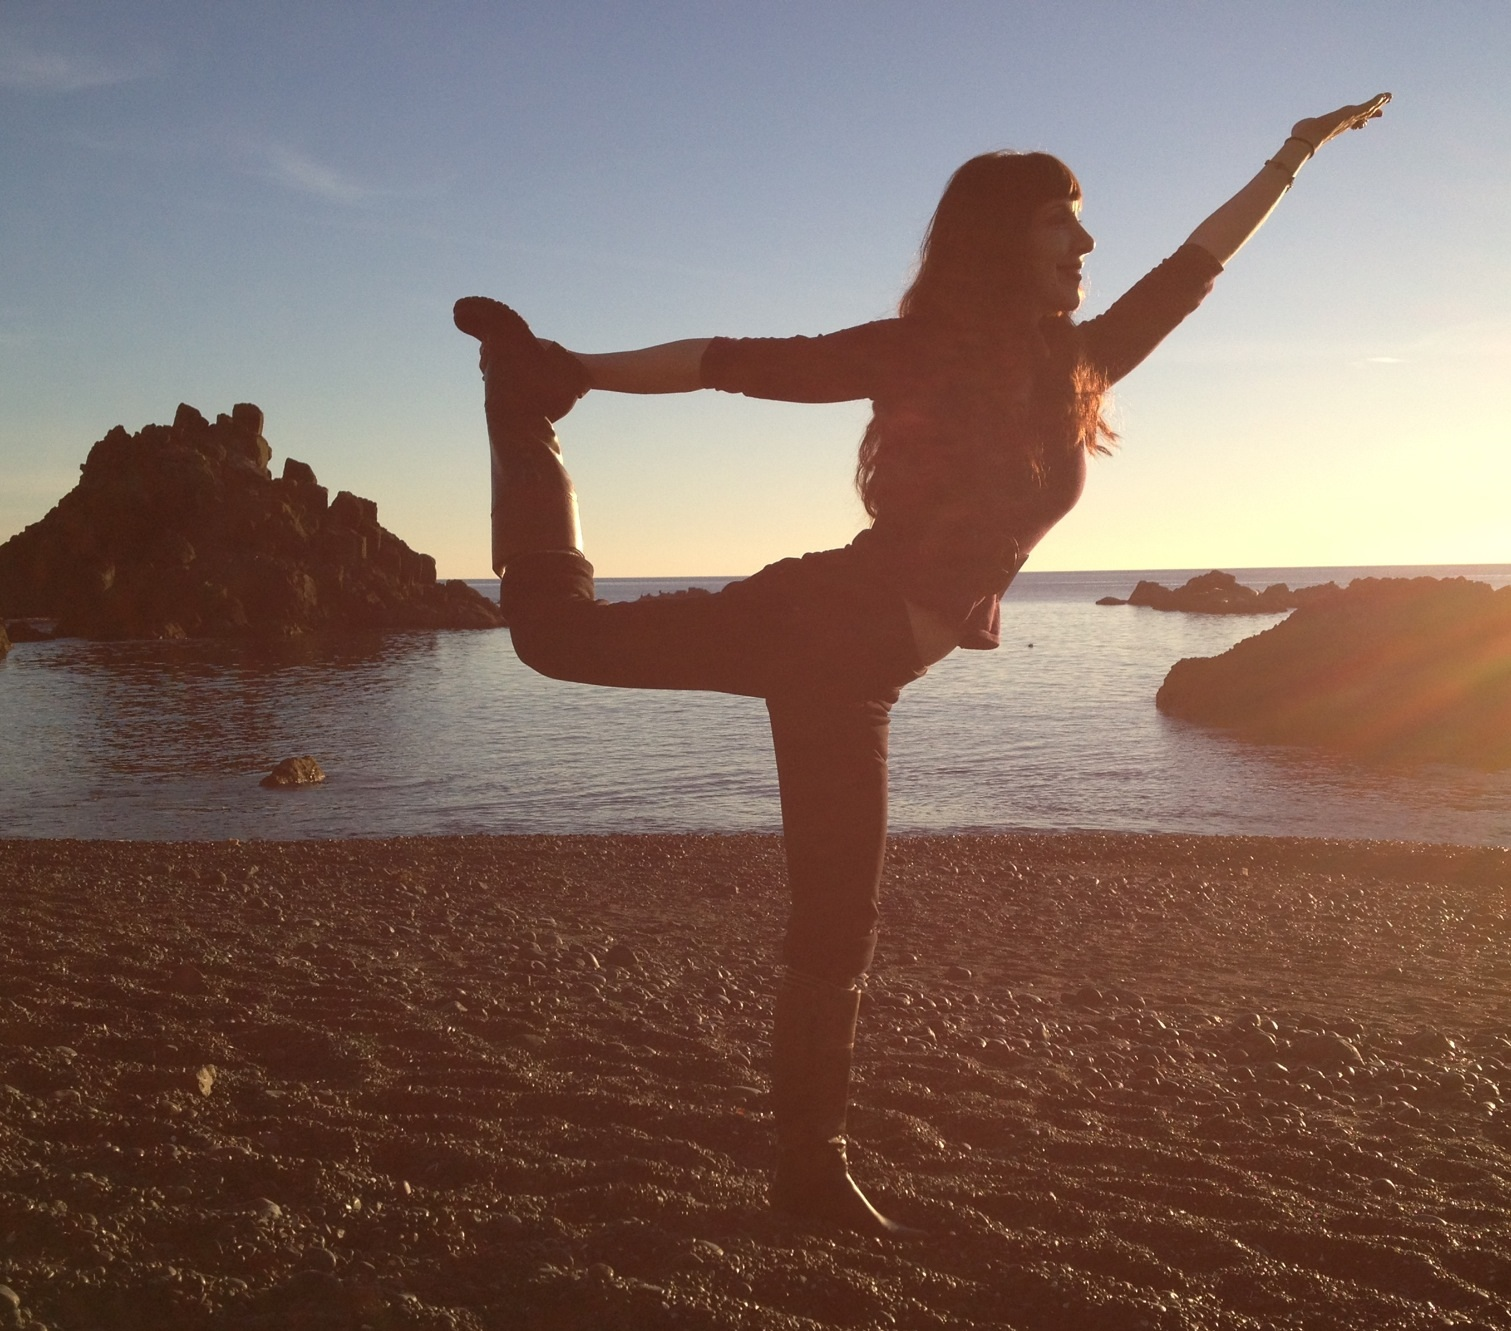 Early Bird Yoga Pilates Timberhill Athletic Club In